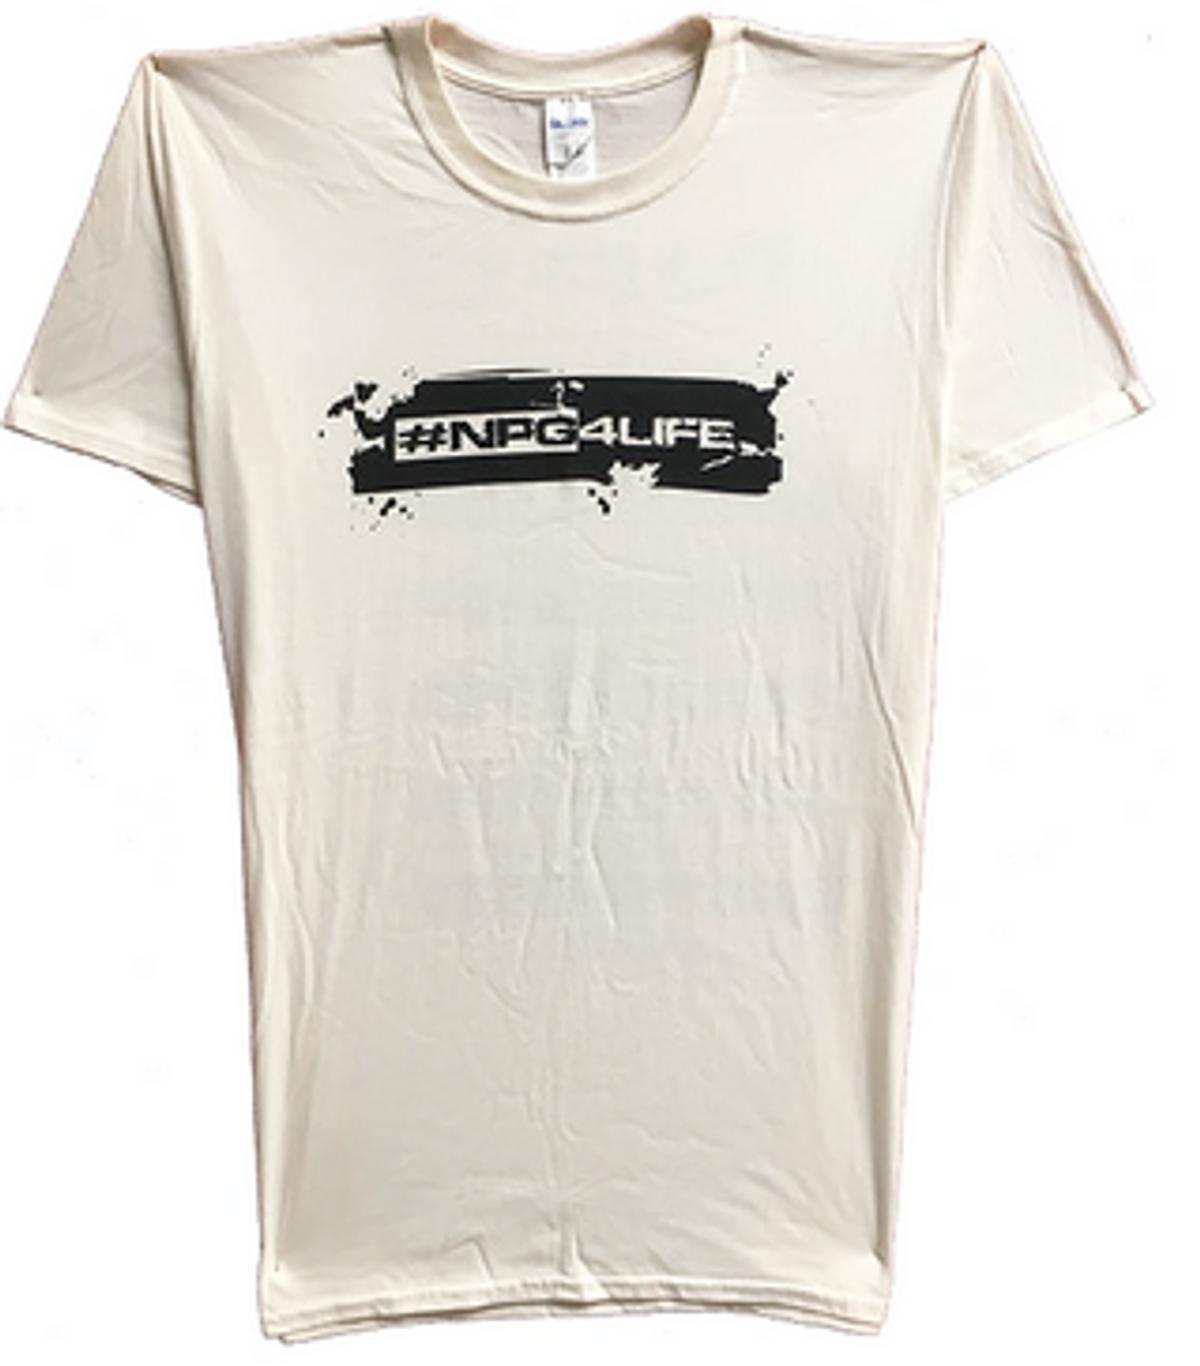 Natural NPG4LIFE T-Shirt w concert dates on back - New Power Generation